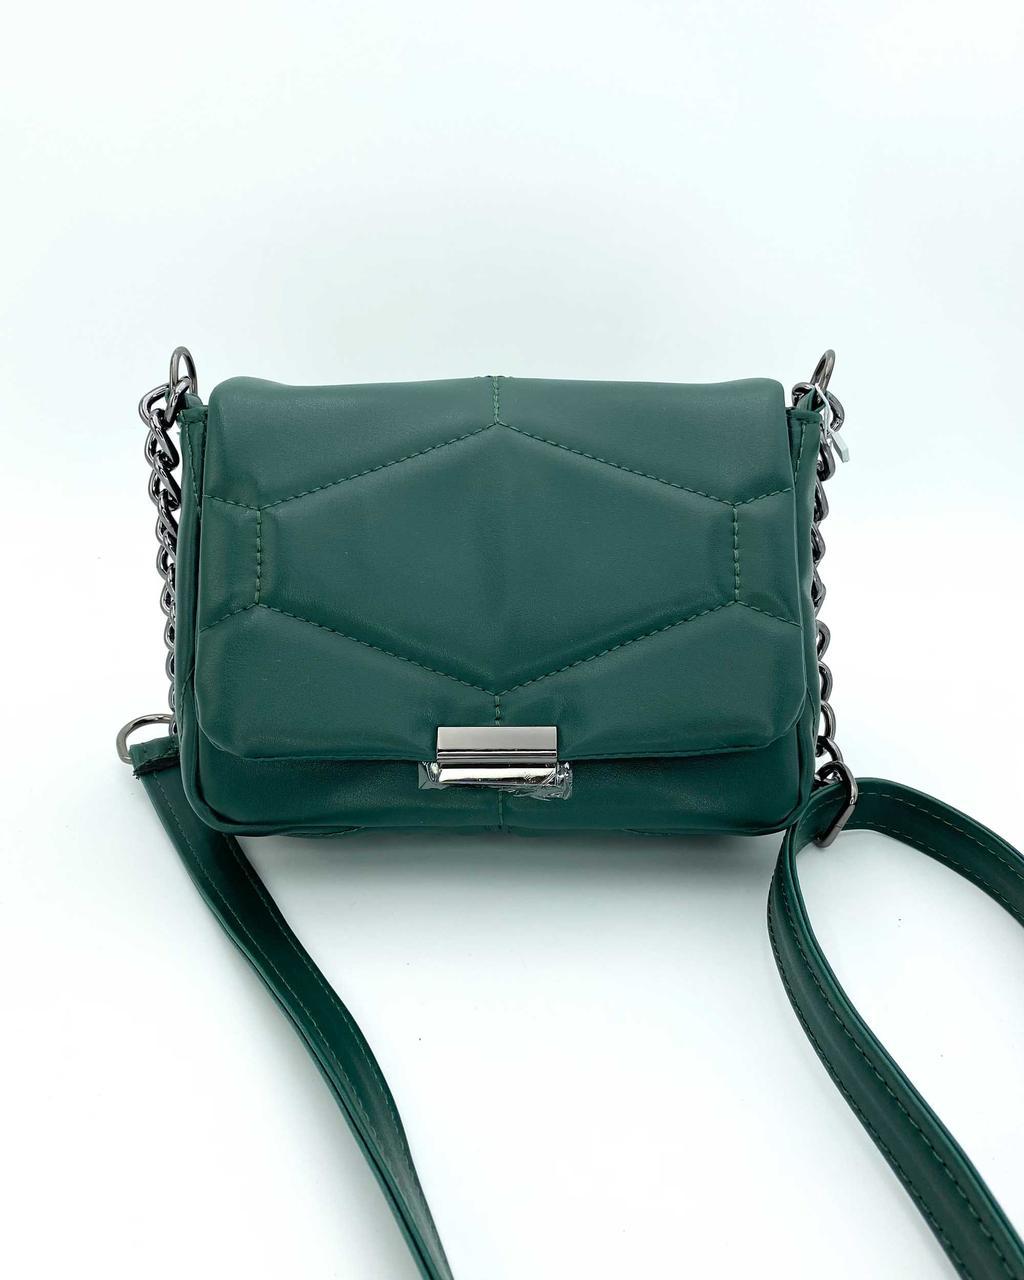 Сумочка зелена через плече стильна жіноча маленька крос боді елегантна сумка зеленого кольору